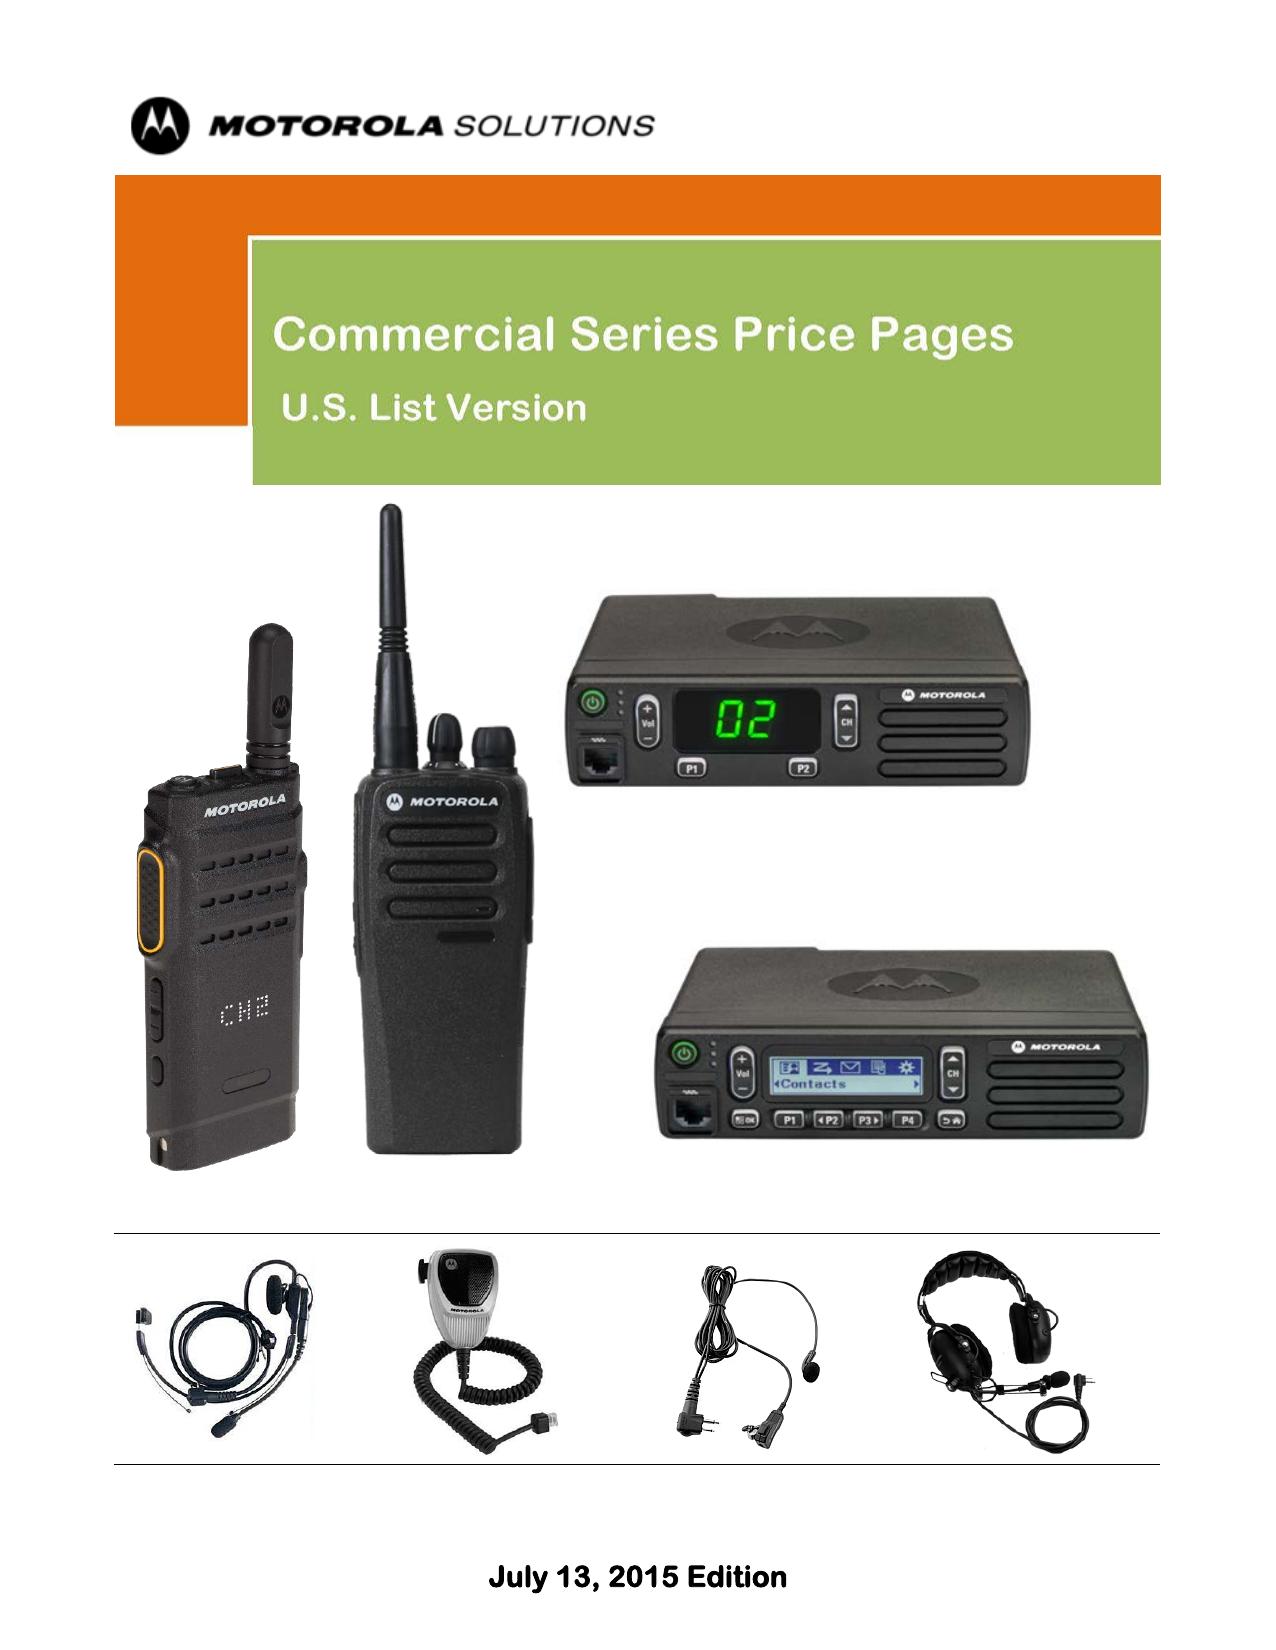 Motorola Commercial ITT57 List Price | manualzz com